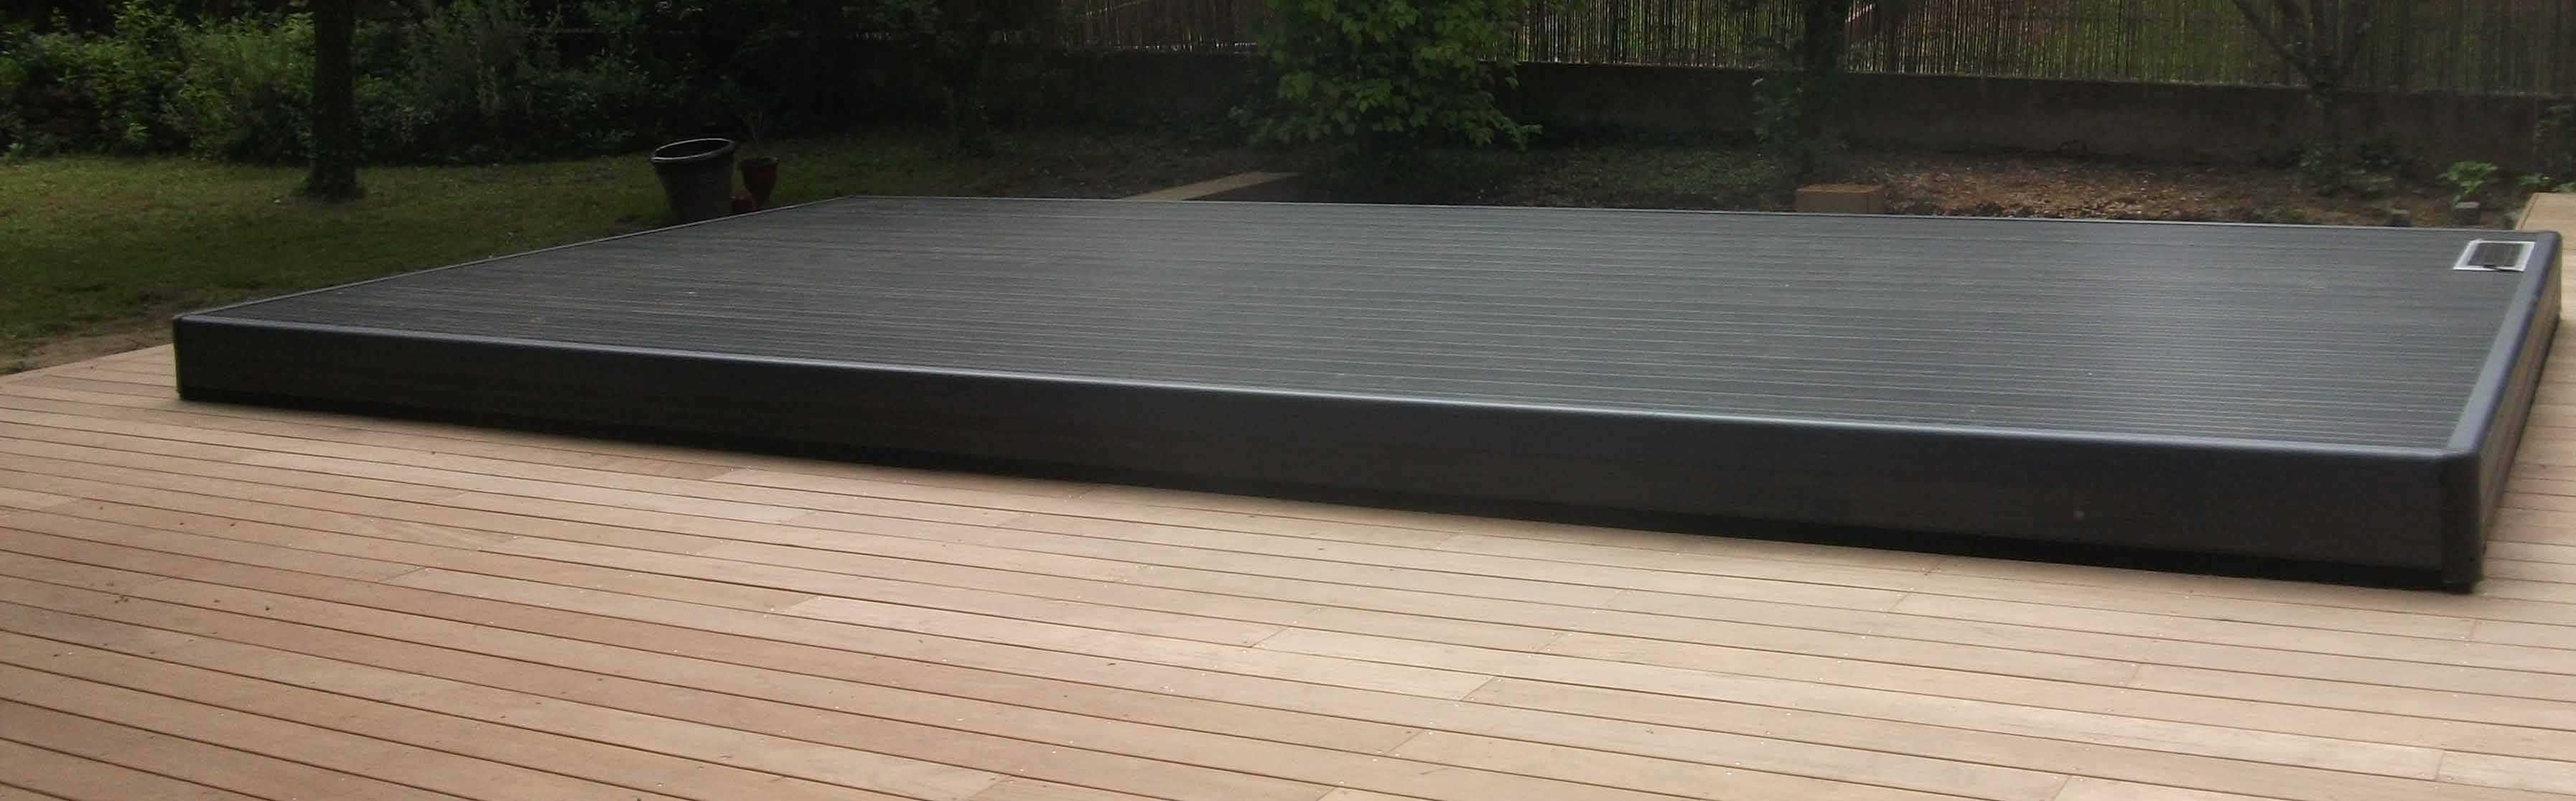 Flat Swimming Pool Enclosure Sliding Wooden Manual Terrasse